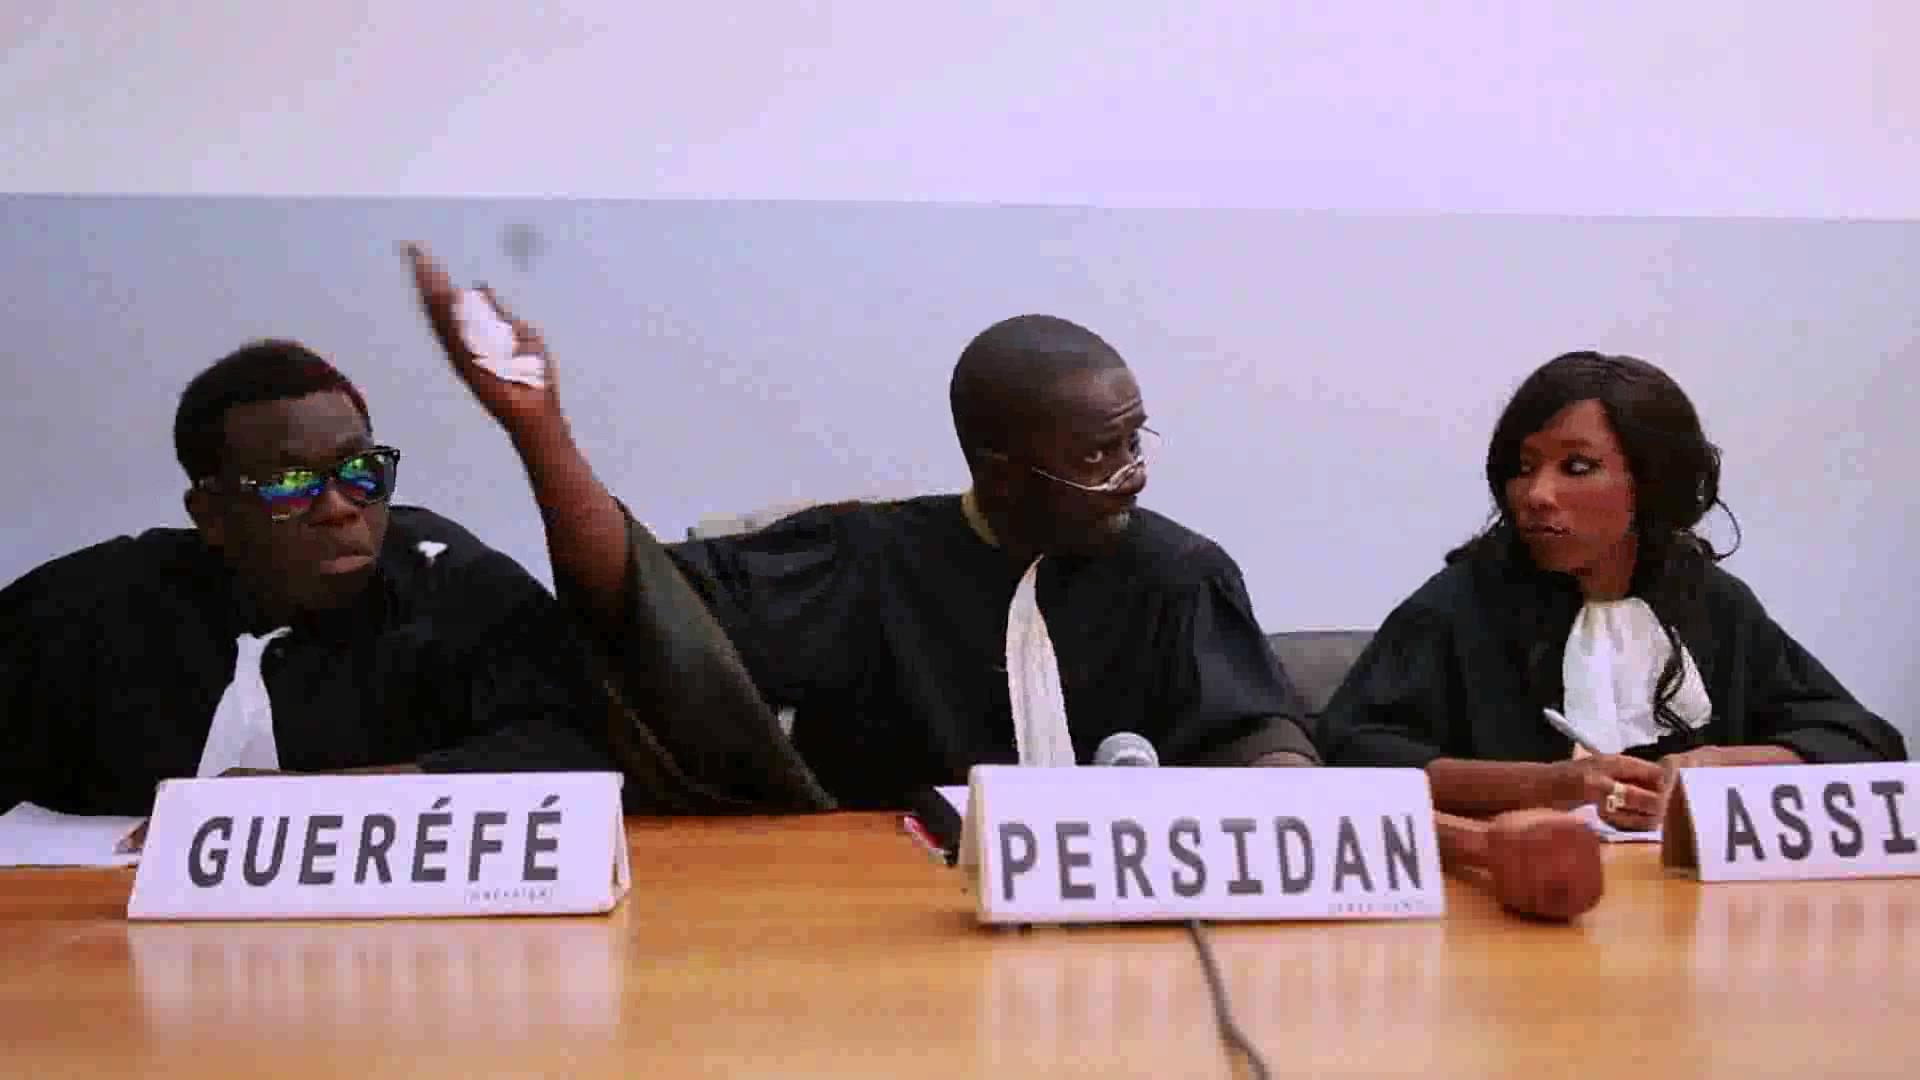 Les délires d'un avocat marron (Par Mamadou Bamba NDIAYE)